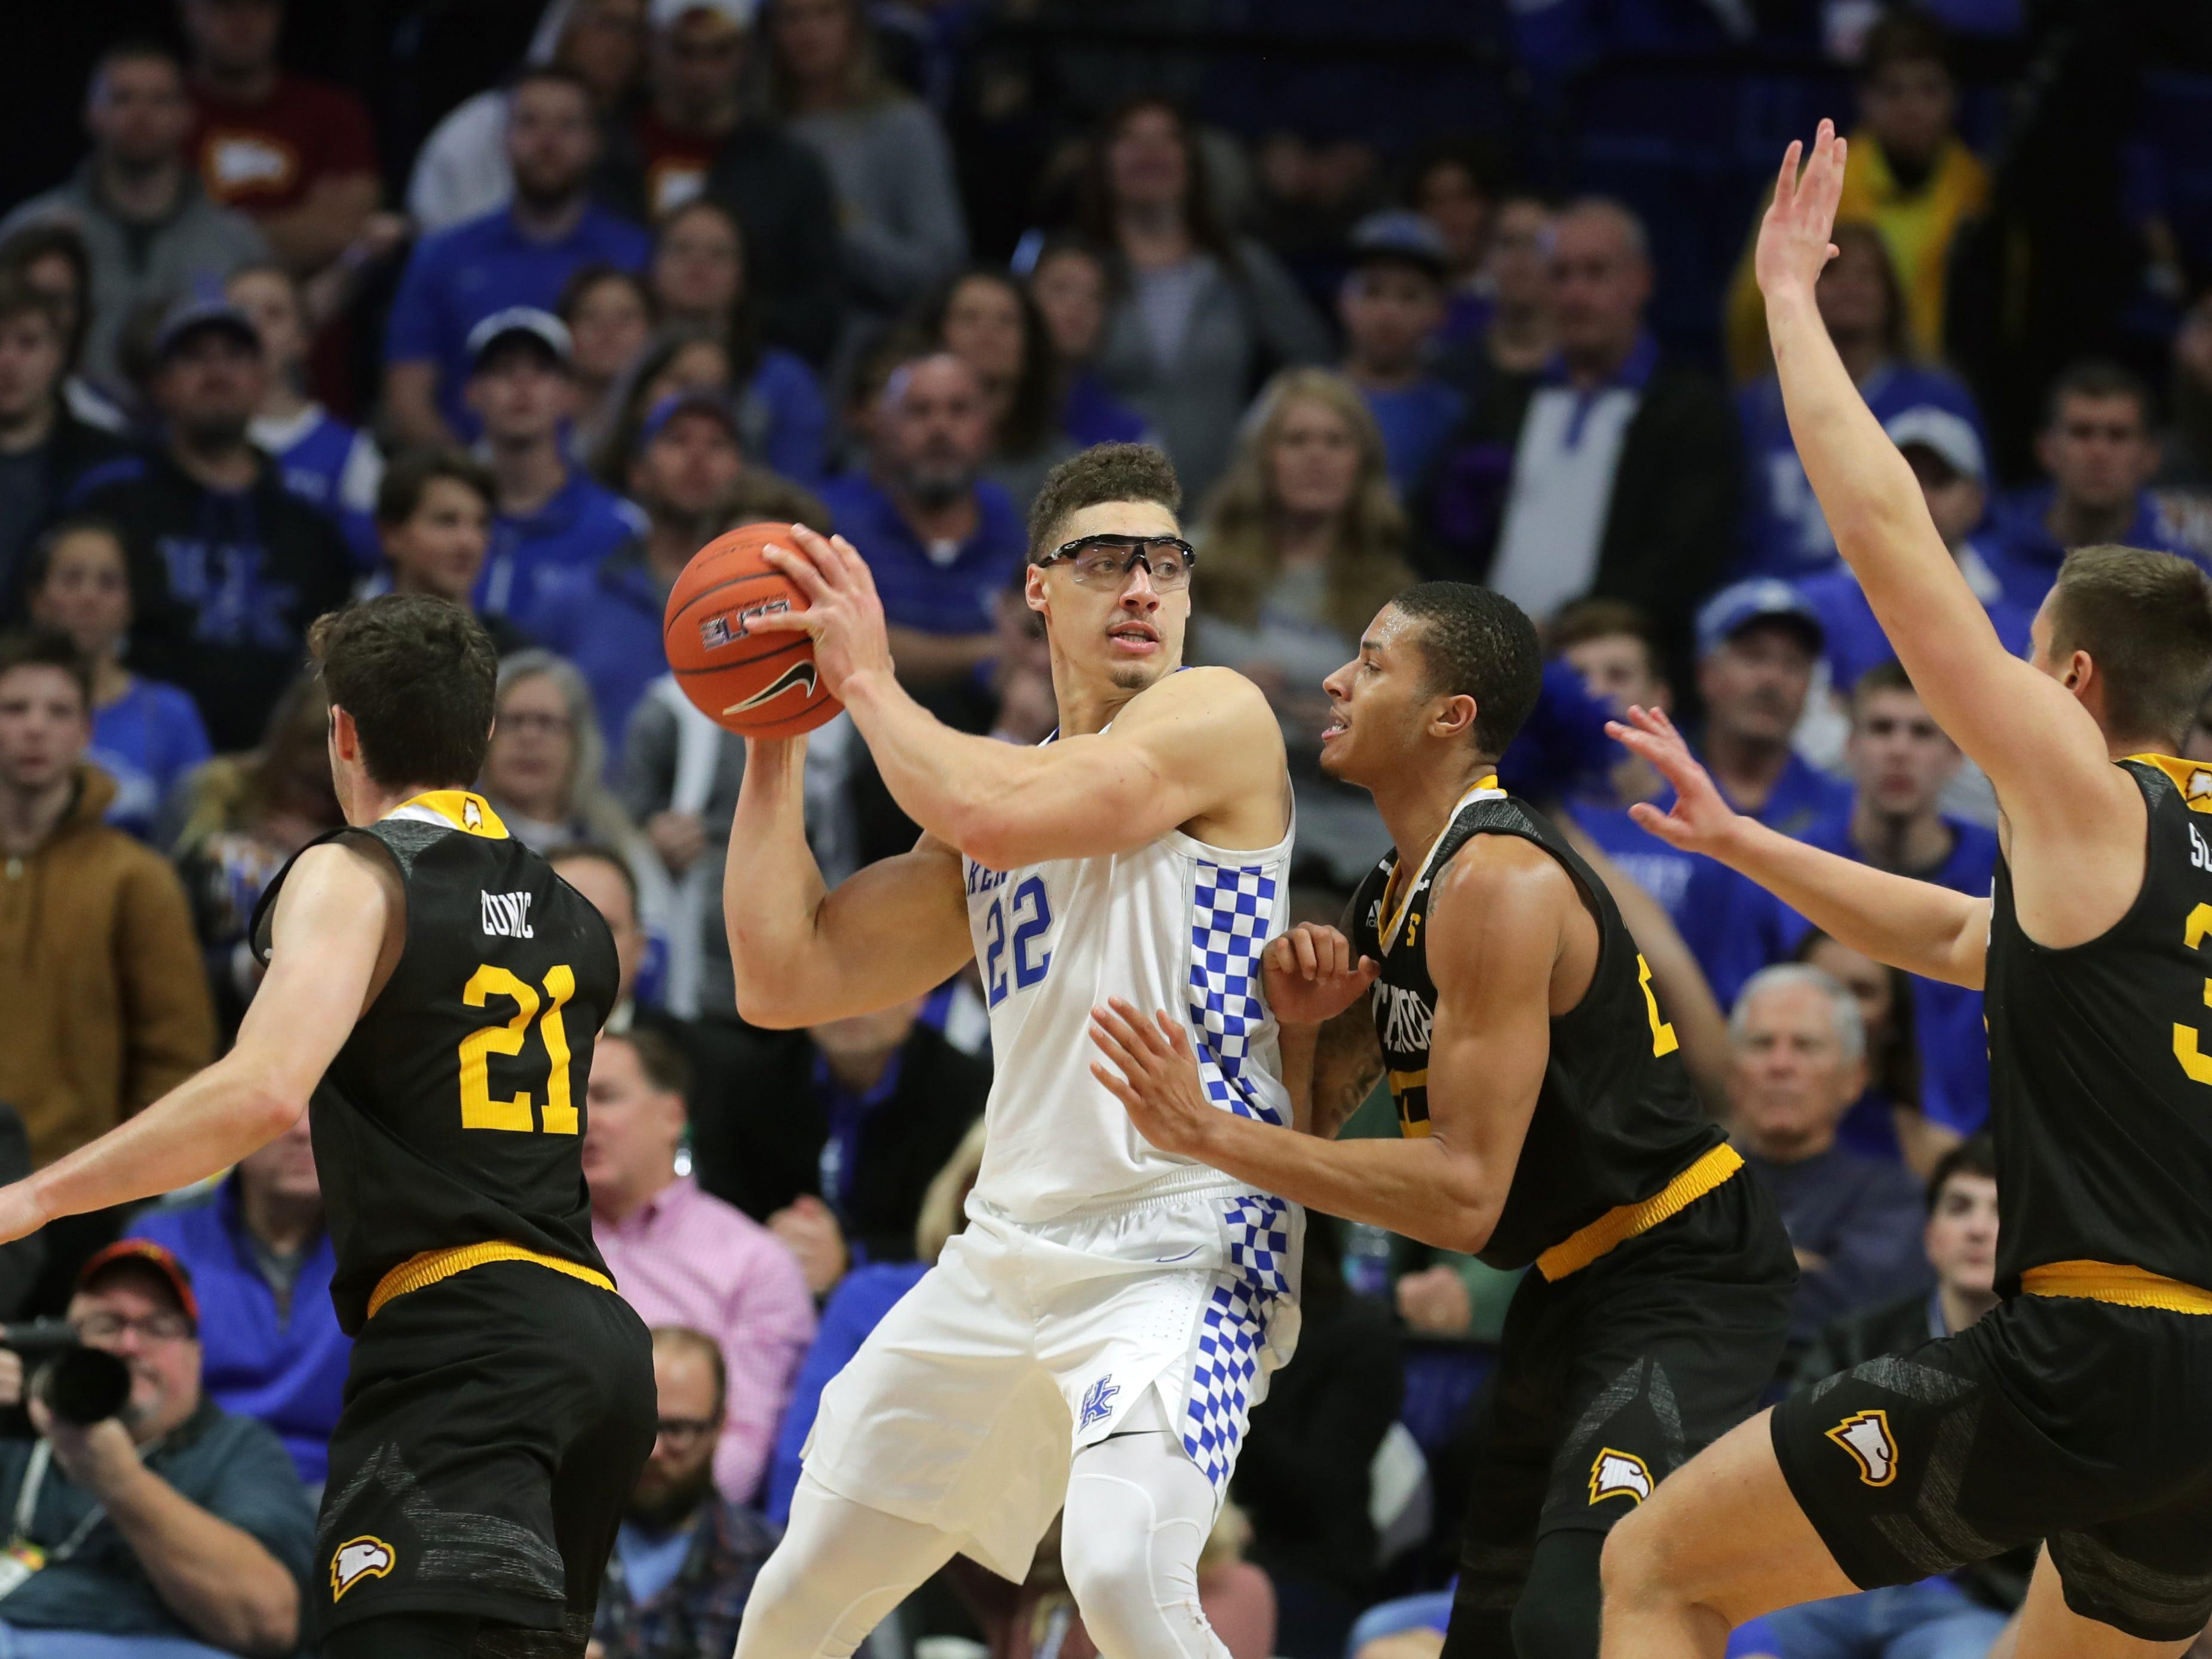 Kentucky's Reid Travis draws plenty of attention from the Winthrop defenders. Nov. 21, 2018